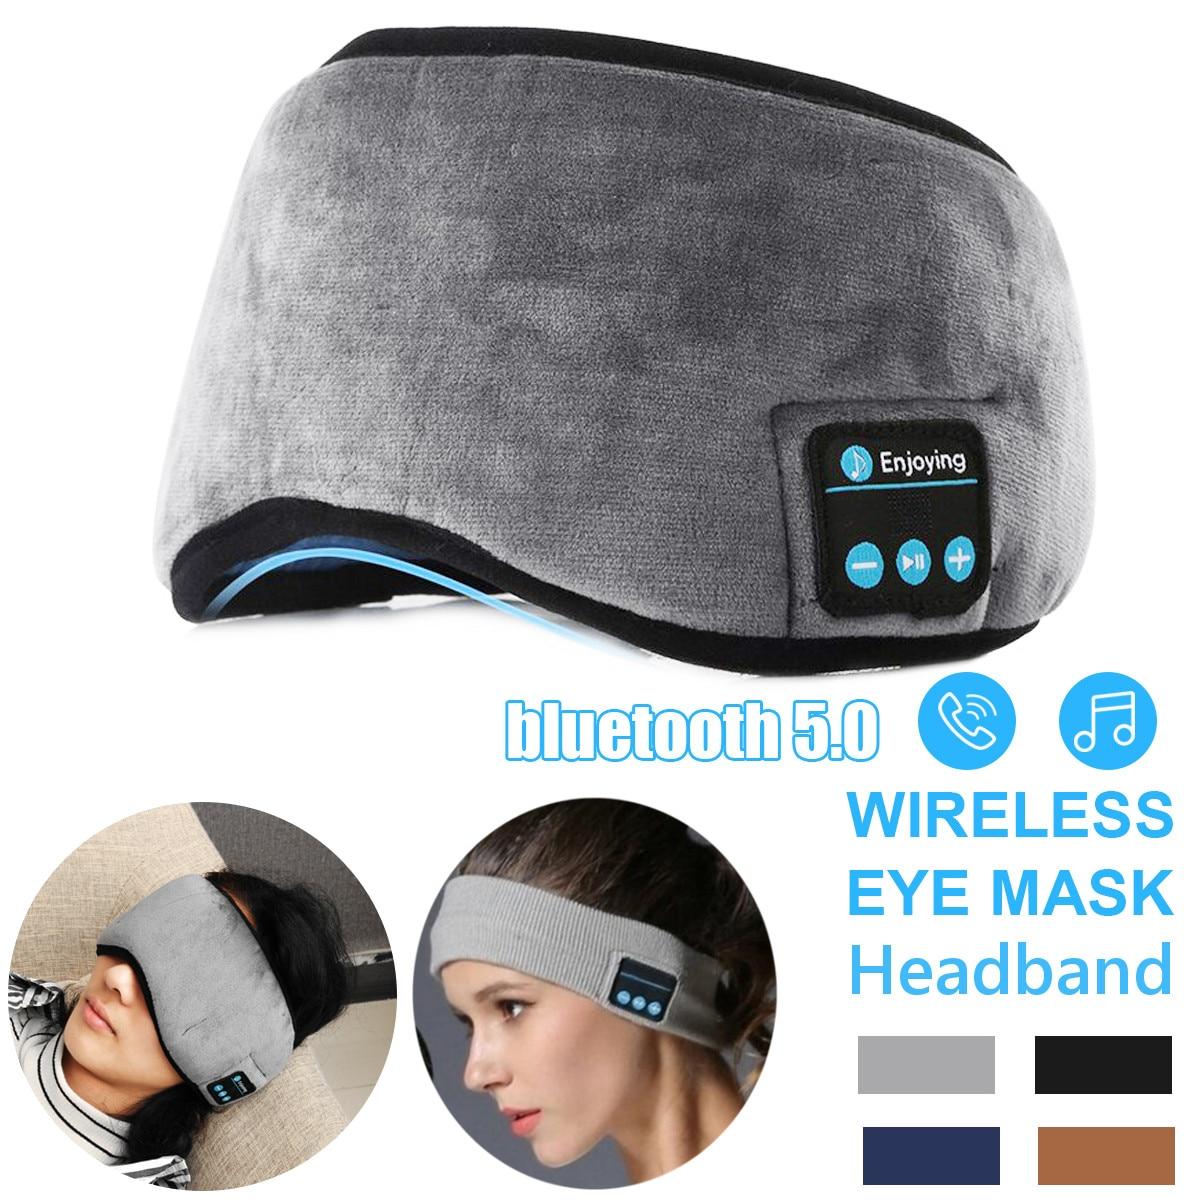 Wireless bluetooth 5 0 Earphones Sleeping Eye Mask Music player   Sports headband Travel Headset Speakers Built-in Speakers Mic